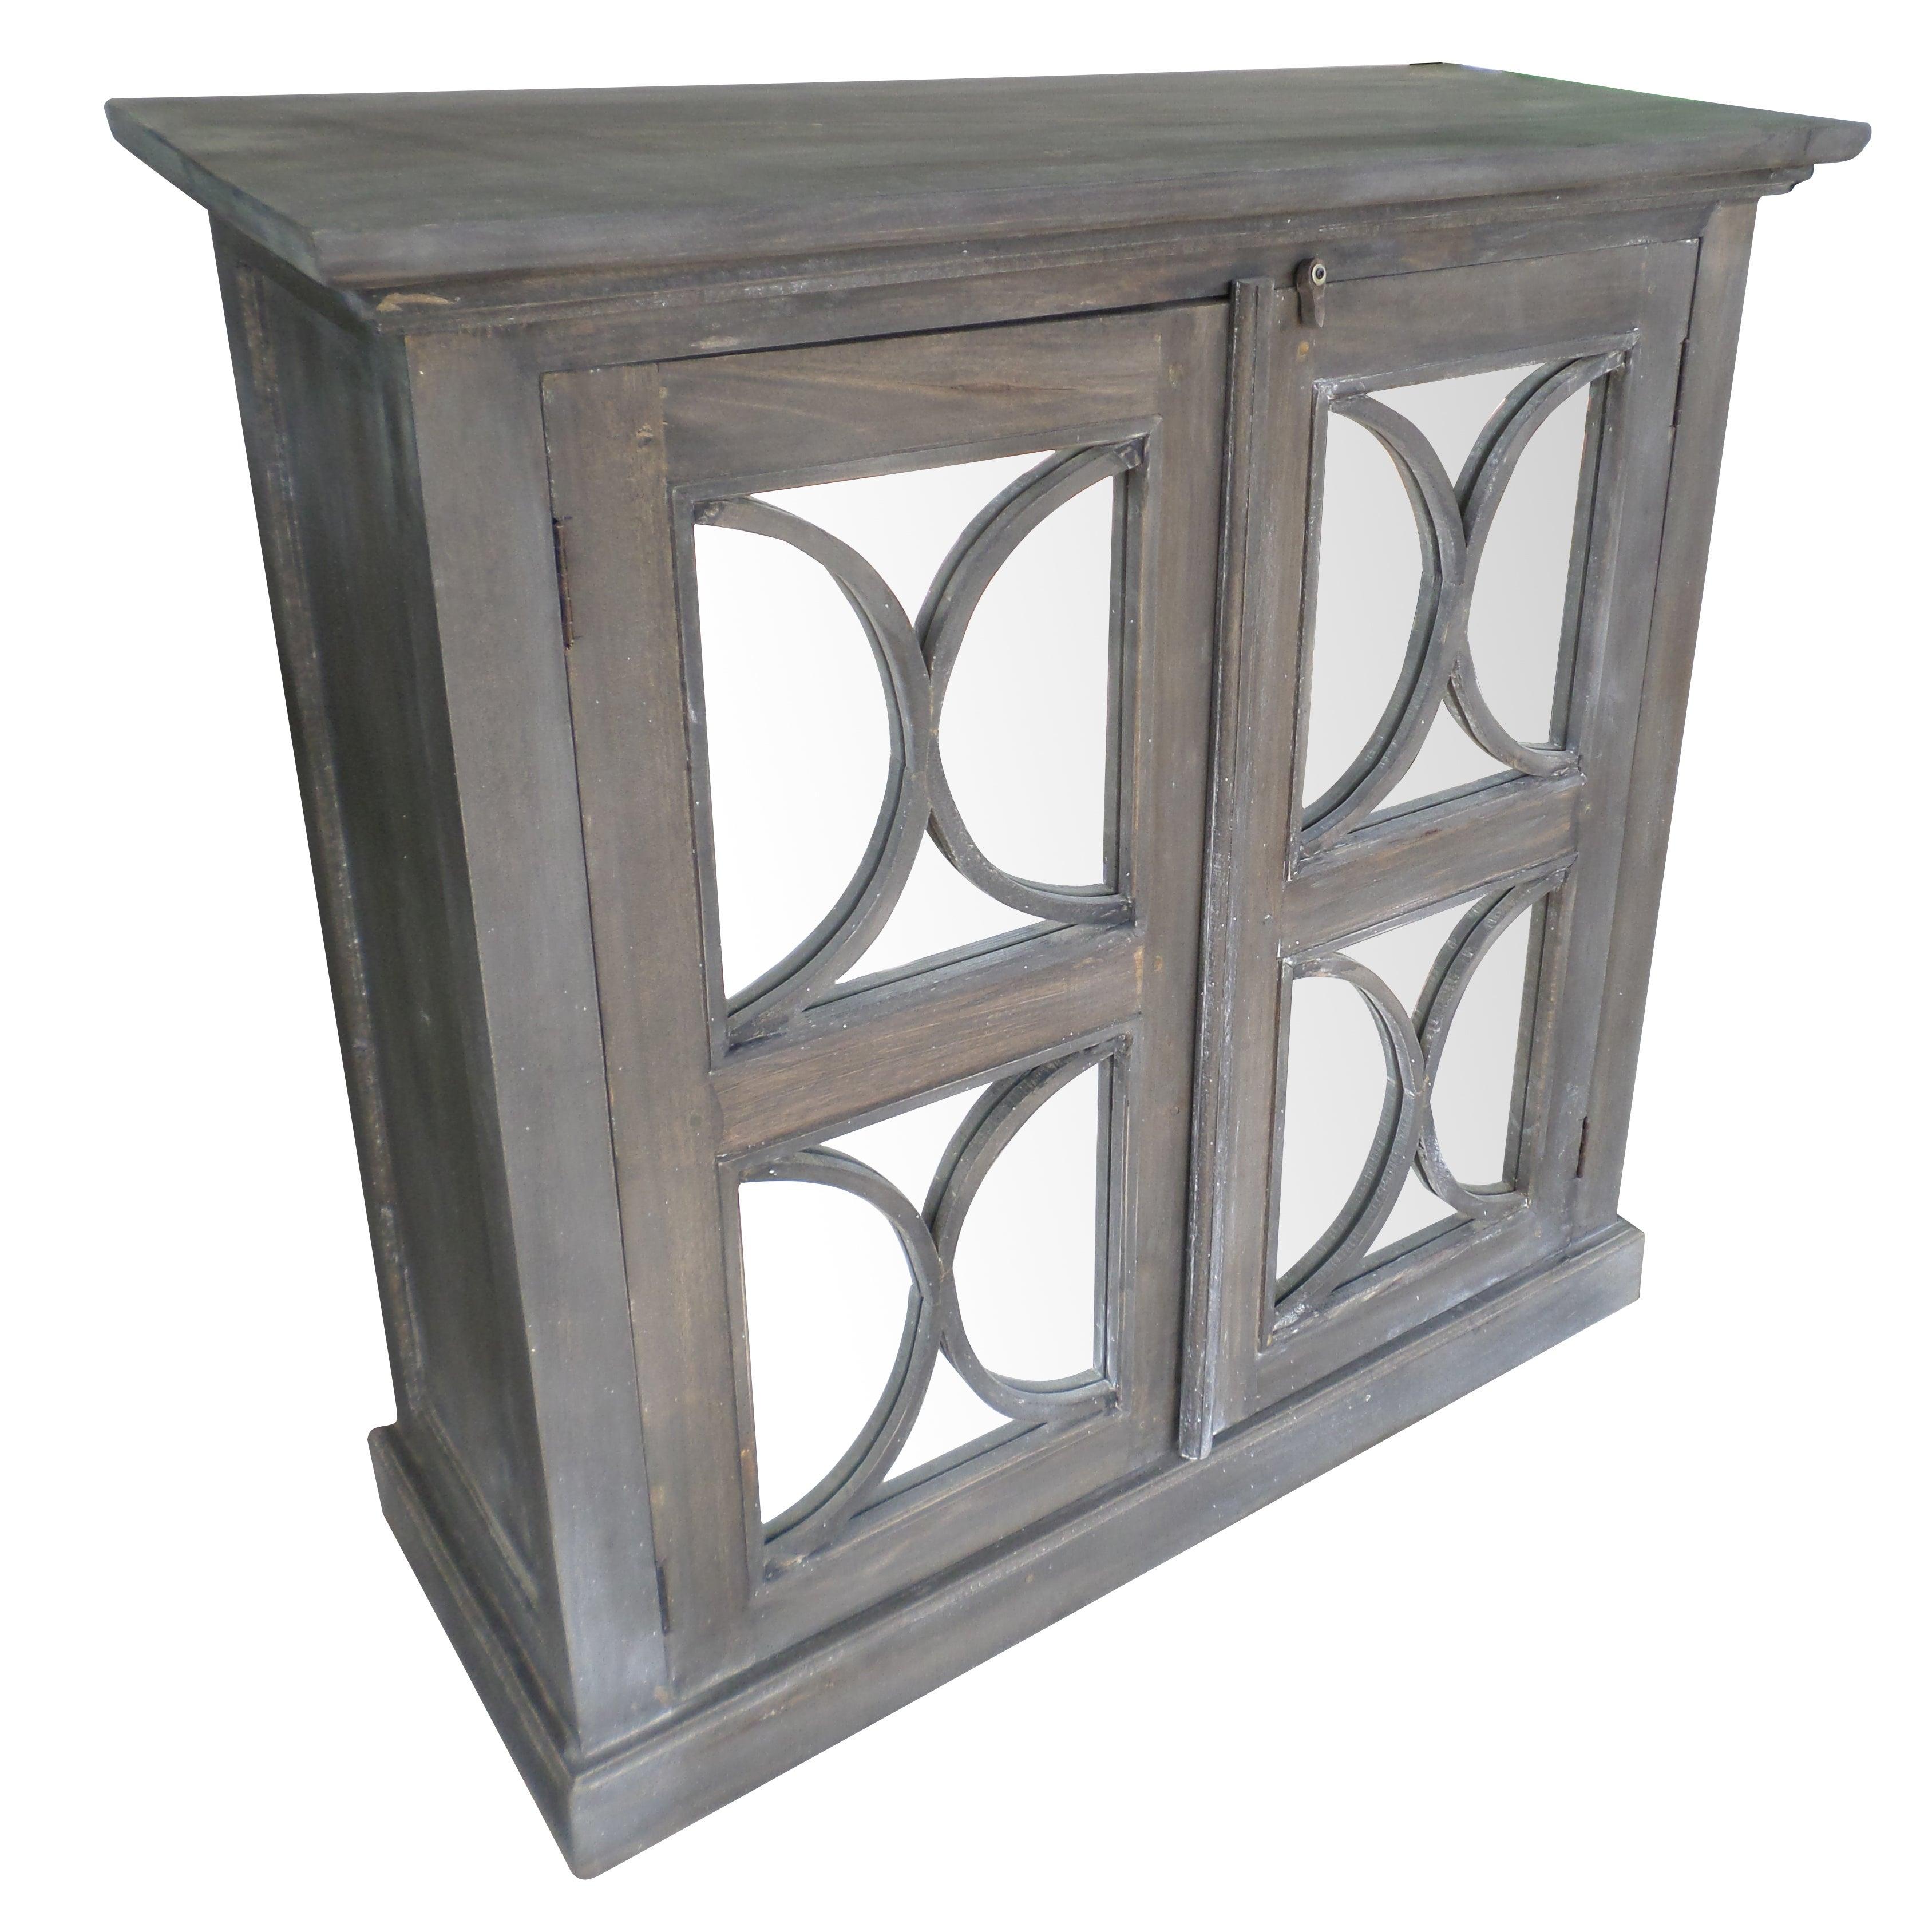 Walnut Wood 39-inch x 16-inch x 39-inch Cabinet (39X16X39...